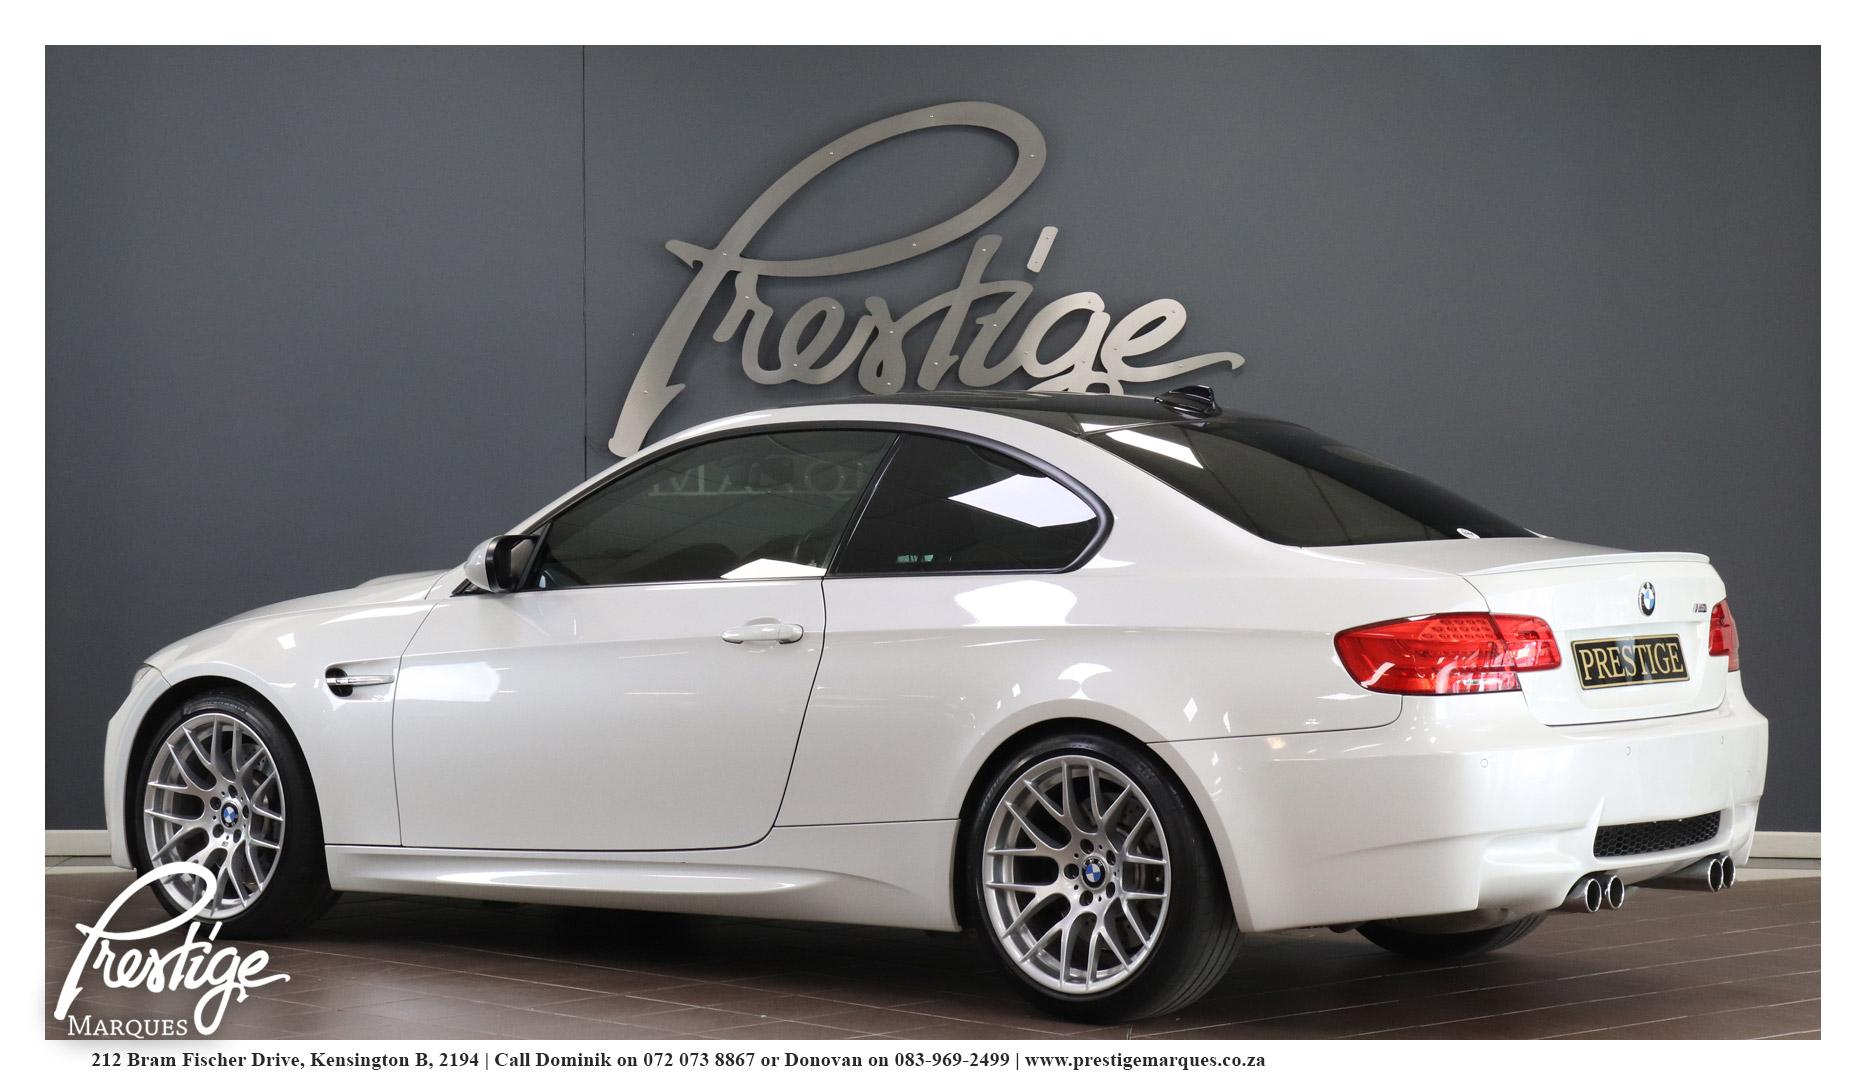 2011-BMW-E92-M3-MDCT-Competition-Package-Prestige-Marques-Randburg-Sandton-5